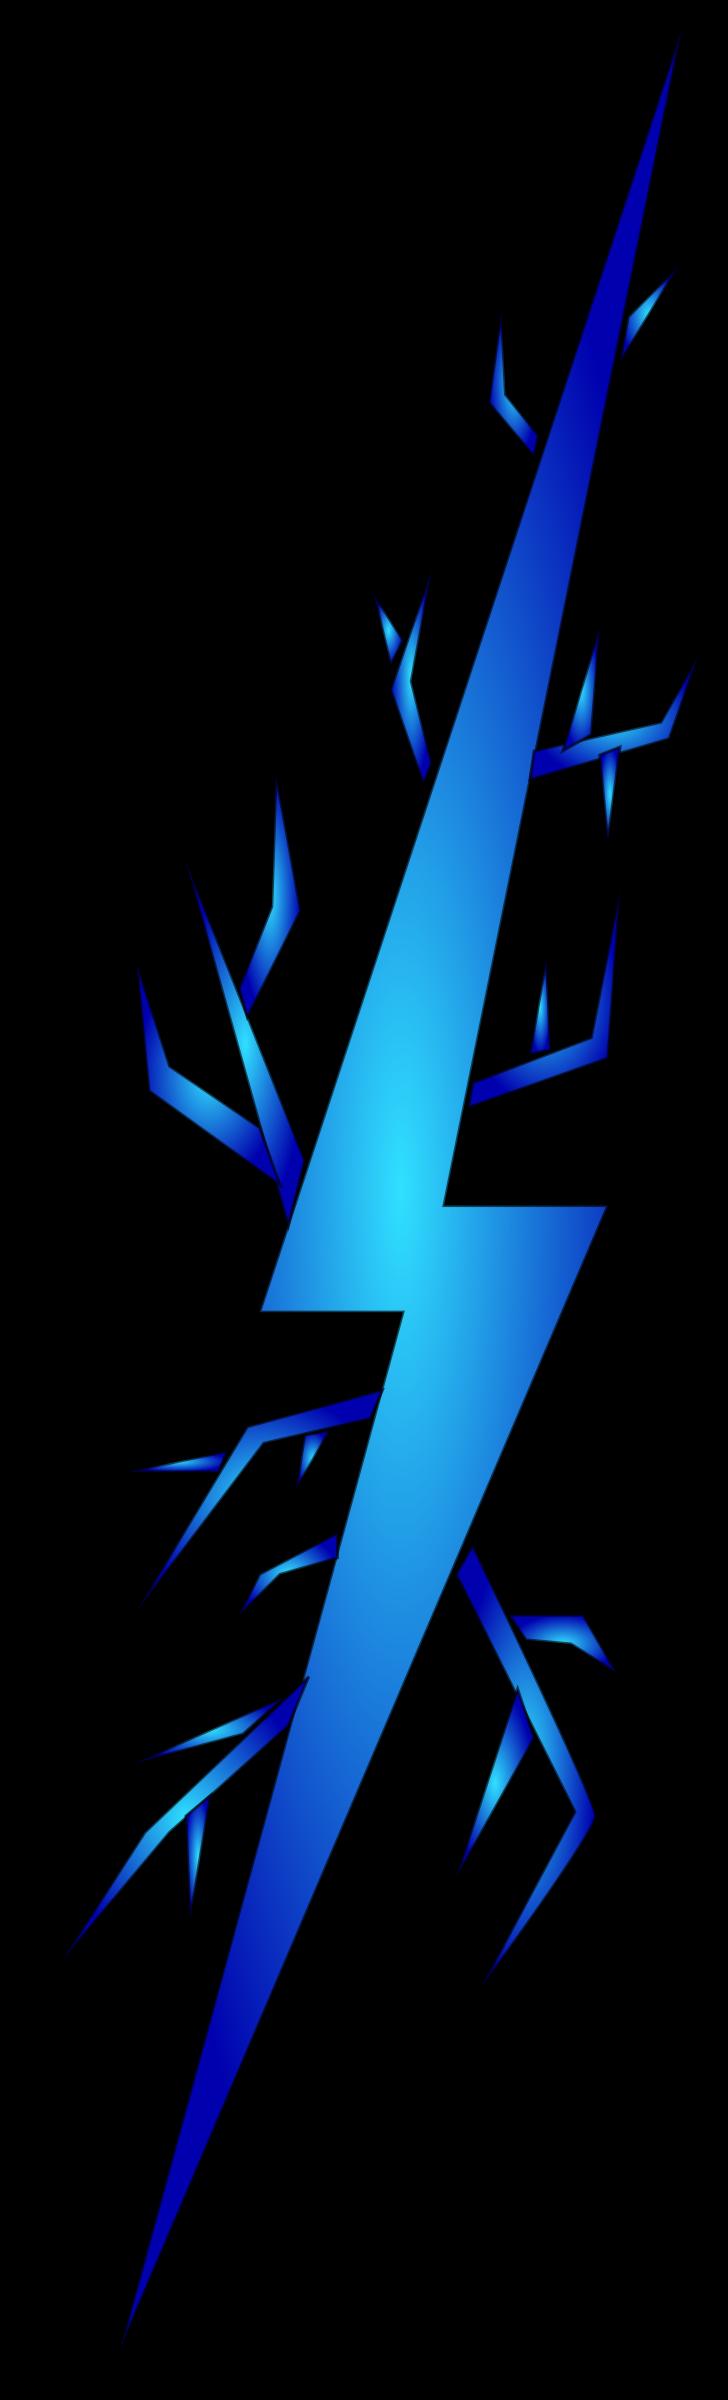 728x2400 Lightning Bolt Clipart, Suggestions For Lightning Bolt Clipart